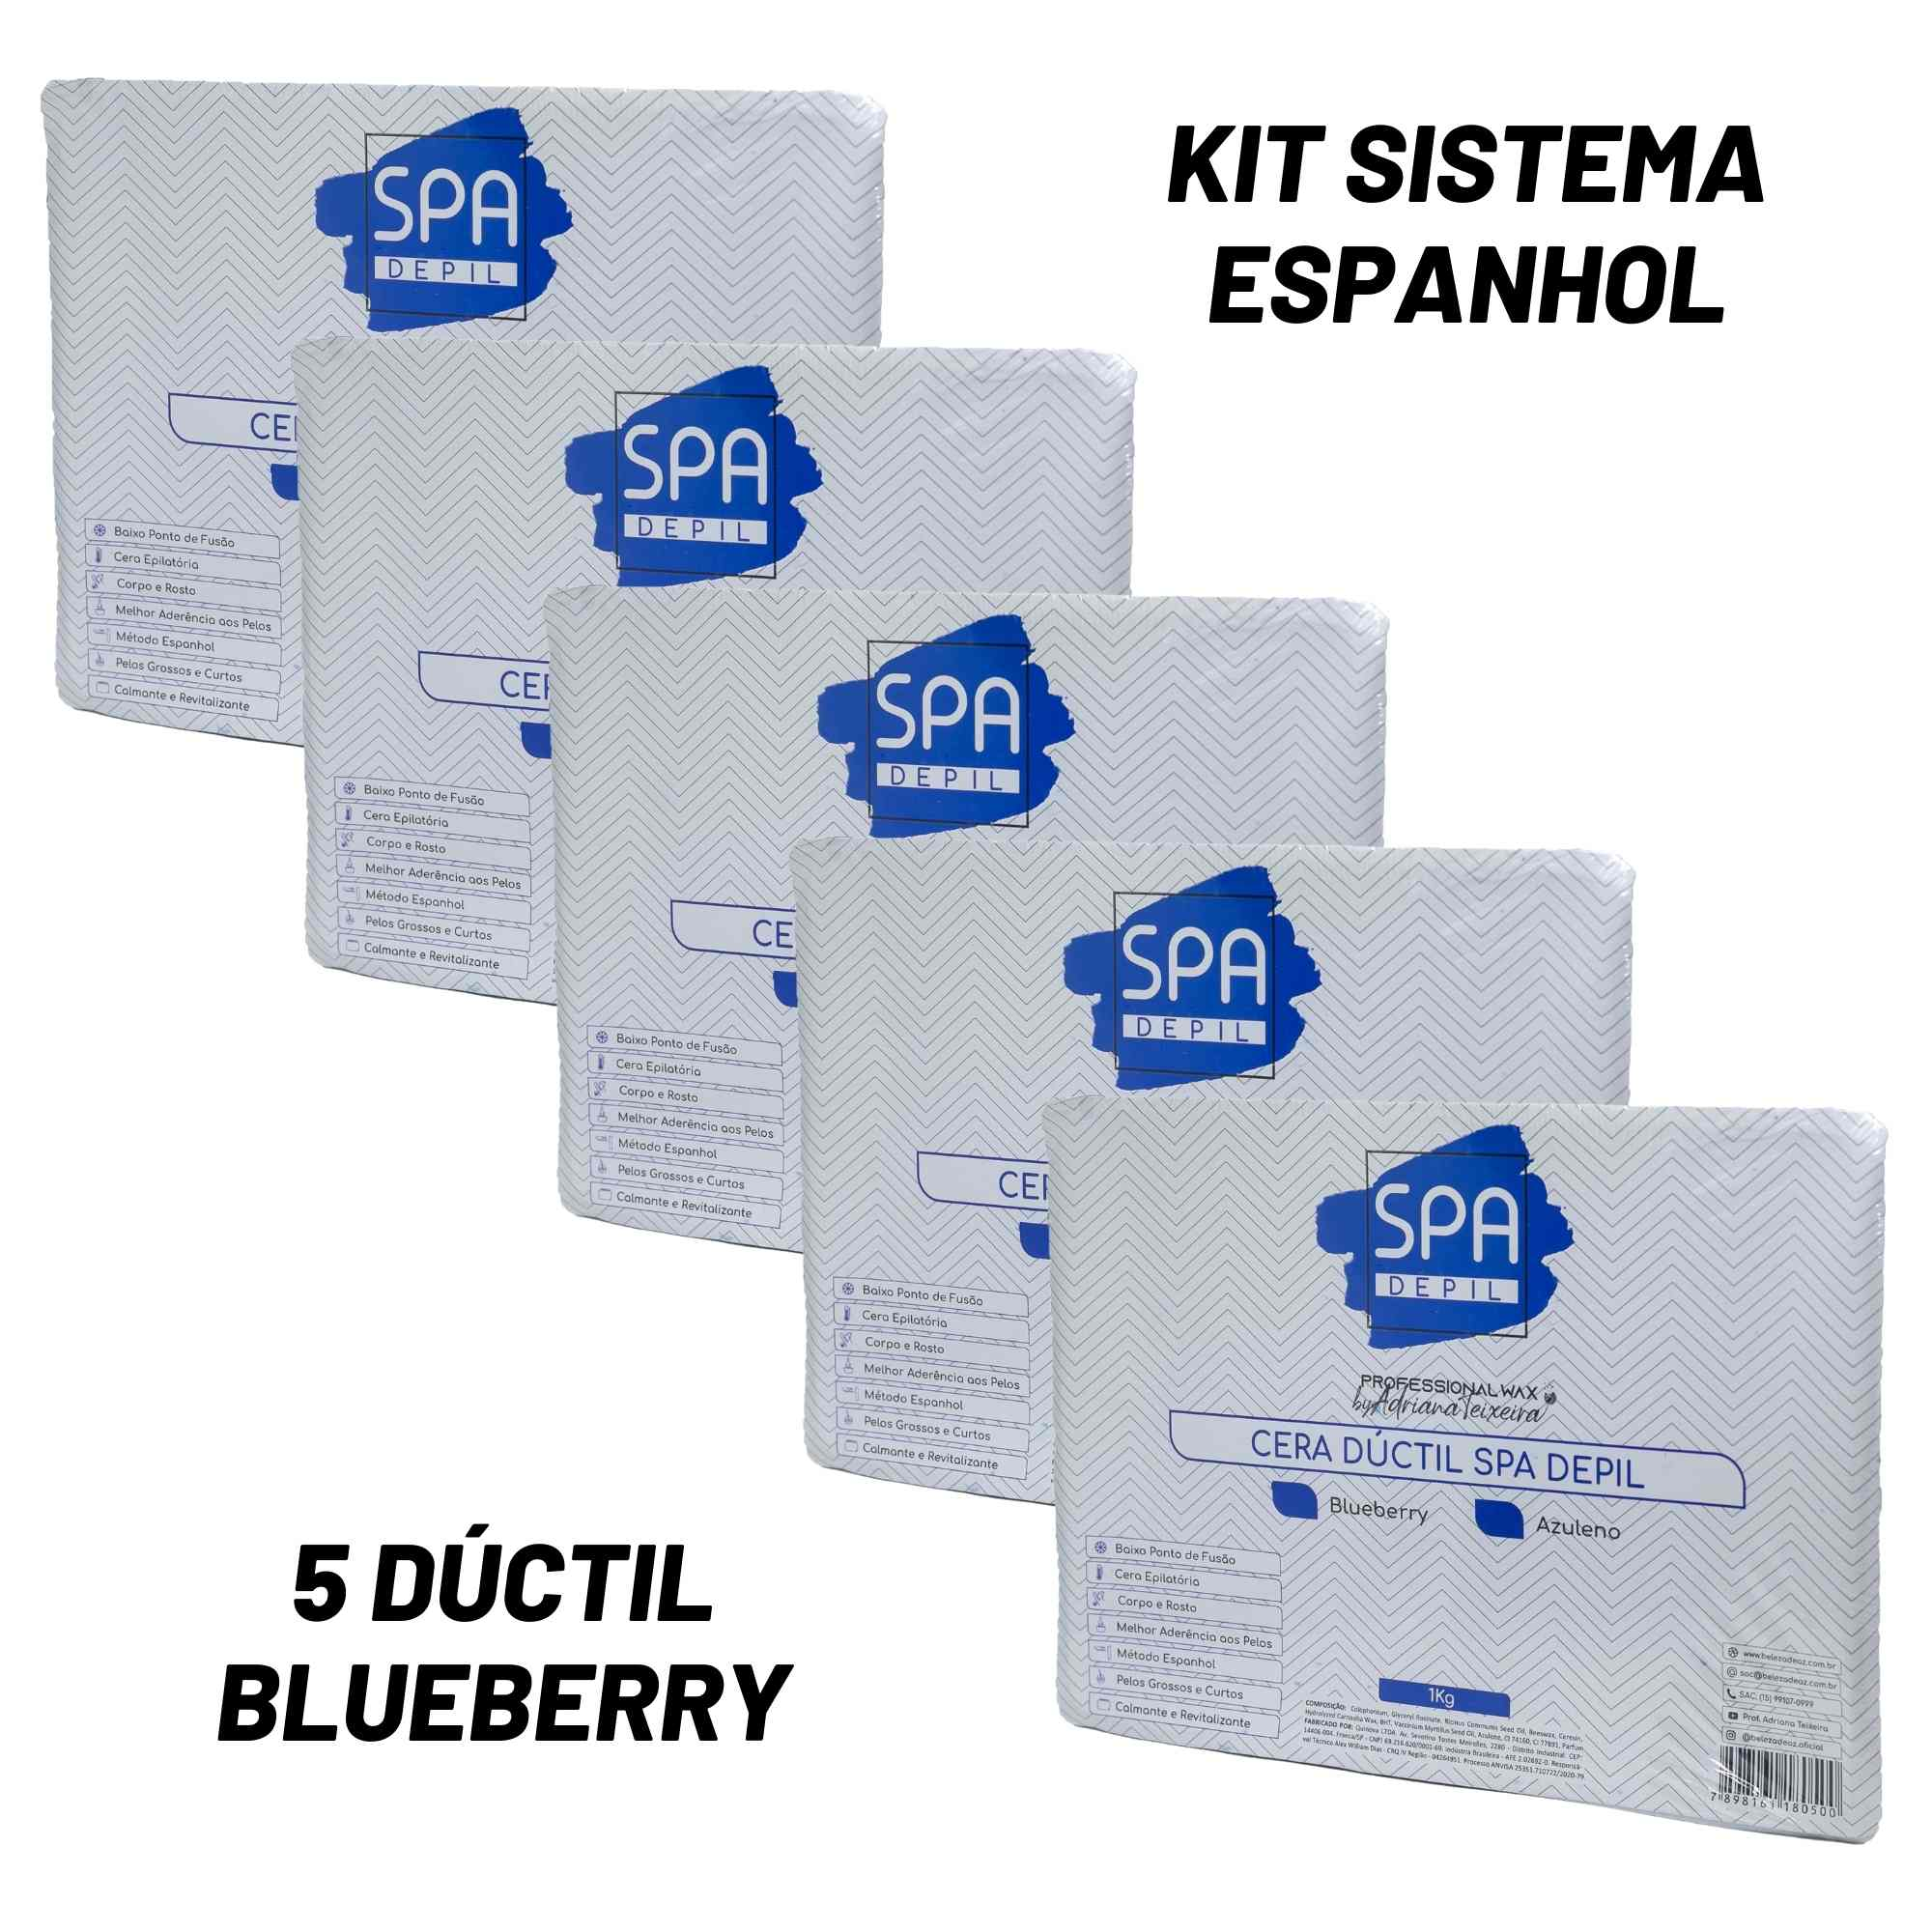 Kit Economico Sistema Espanhol - Cera Ductil+Esp.Angular